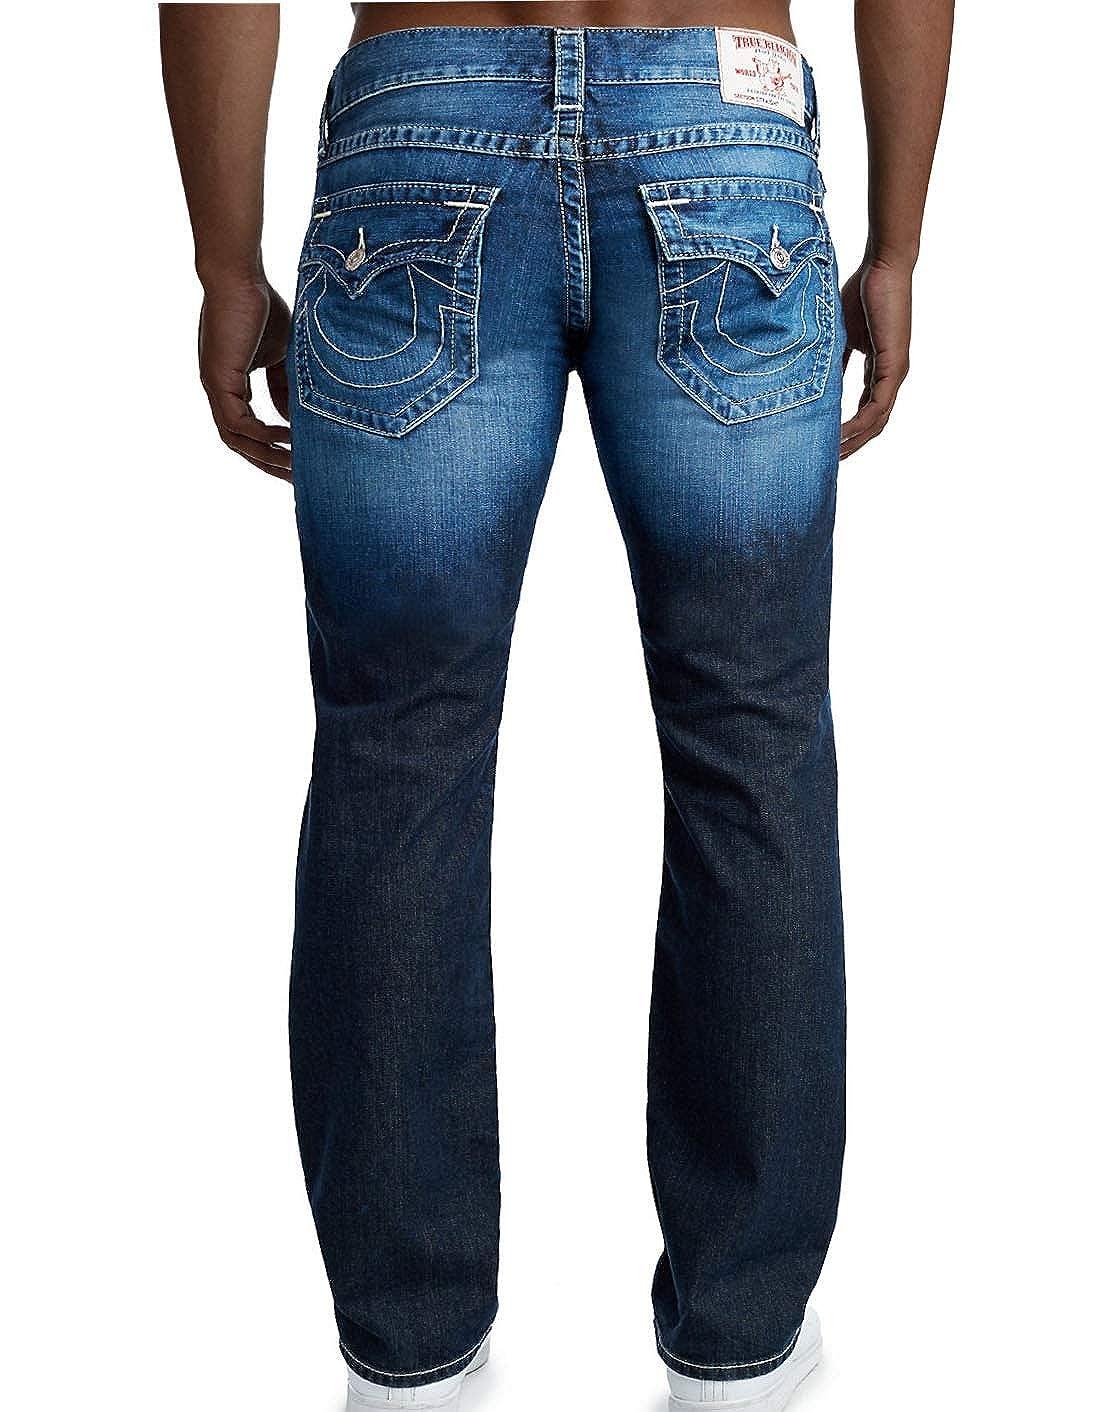 7b01090d2 Amazon.com  True Religion Men s Straight Flap Natural Denim Jeans-Midnight  Seeker-33  Clothing